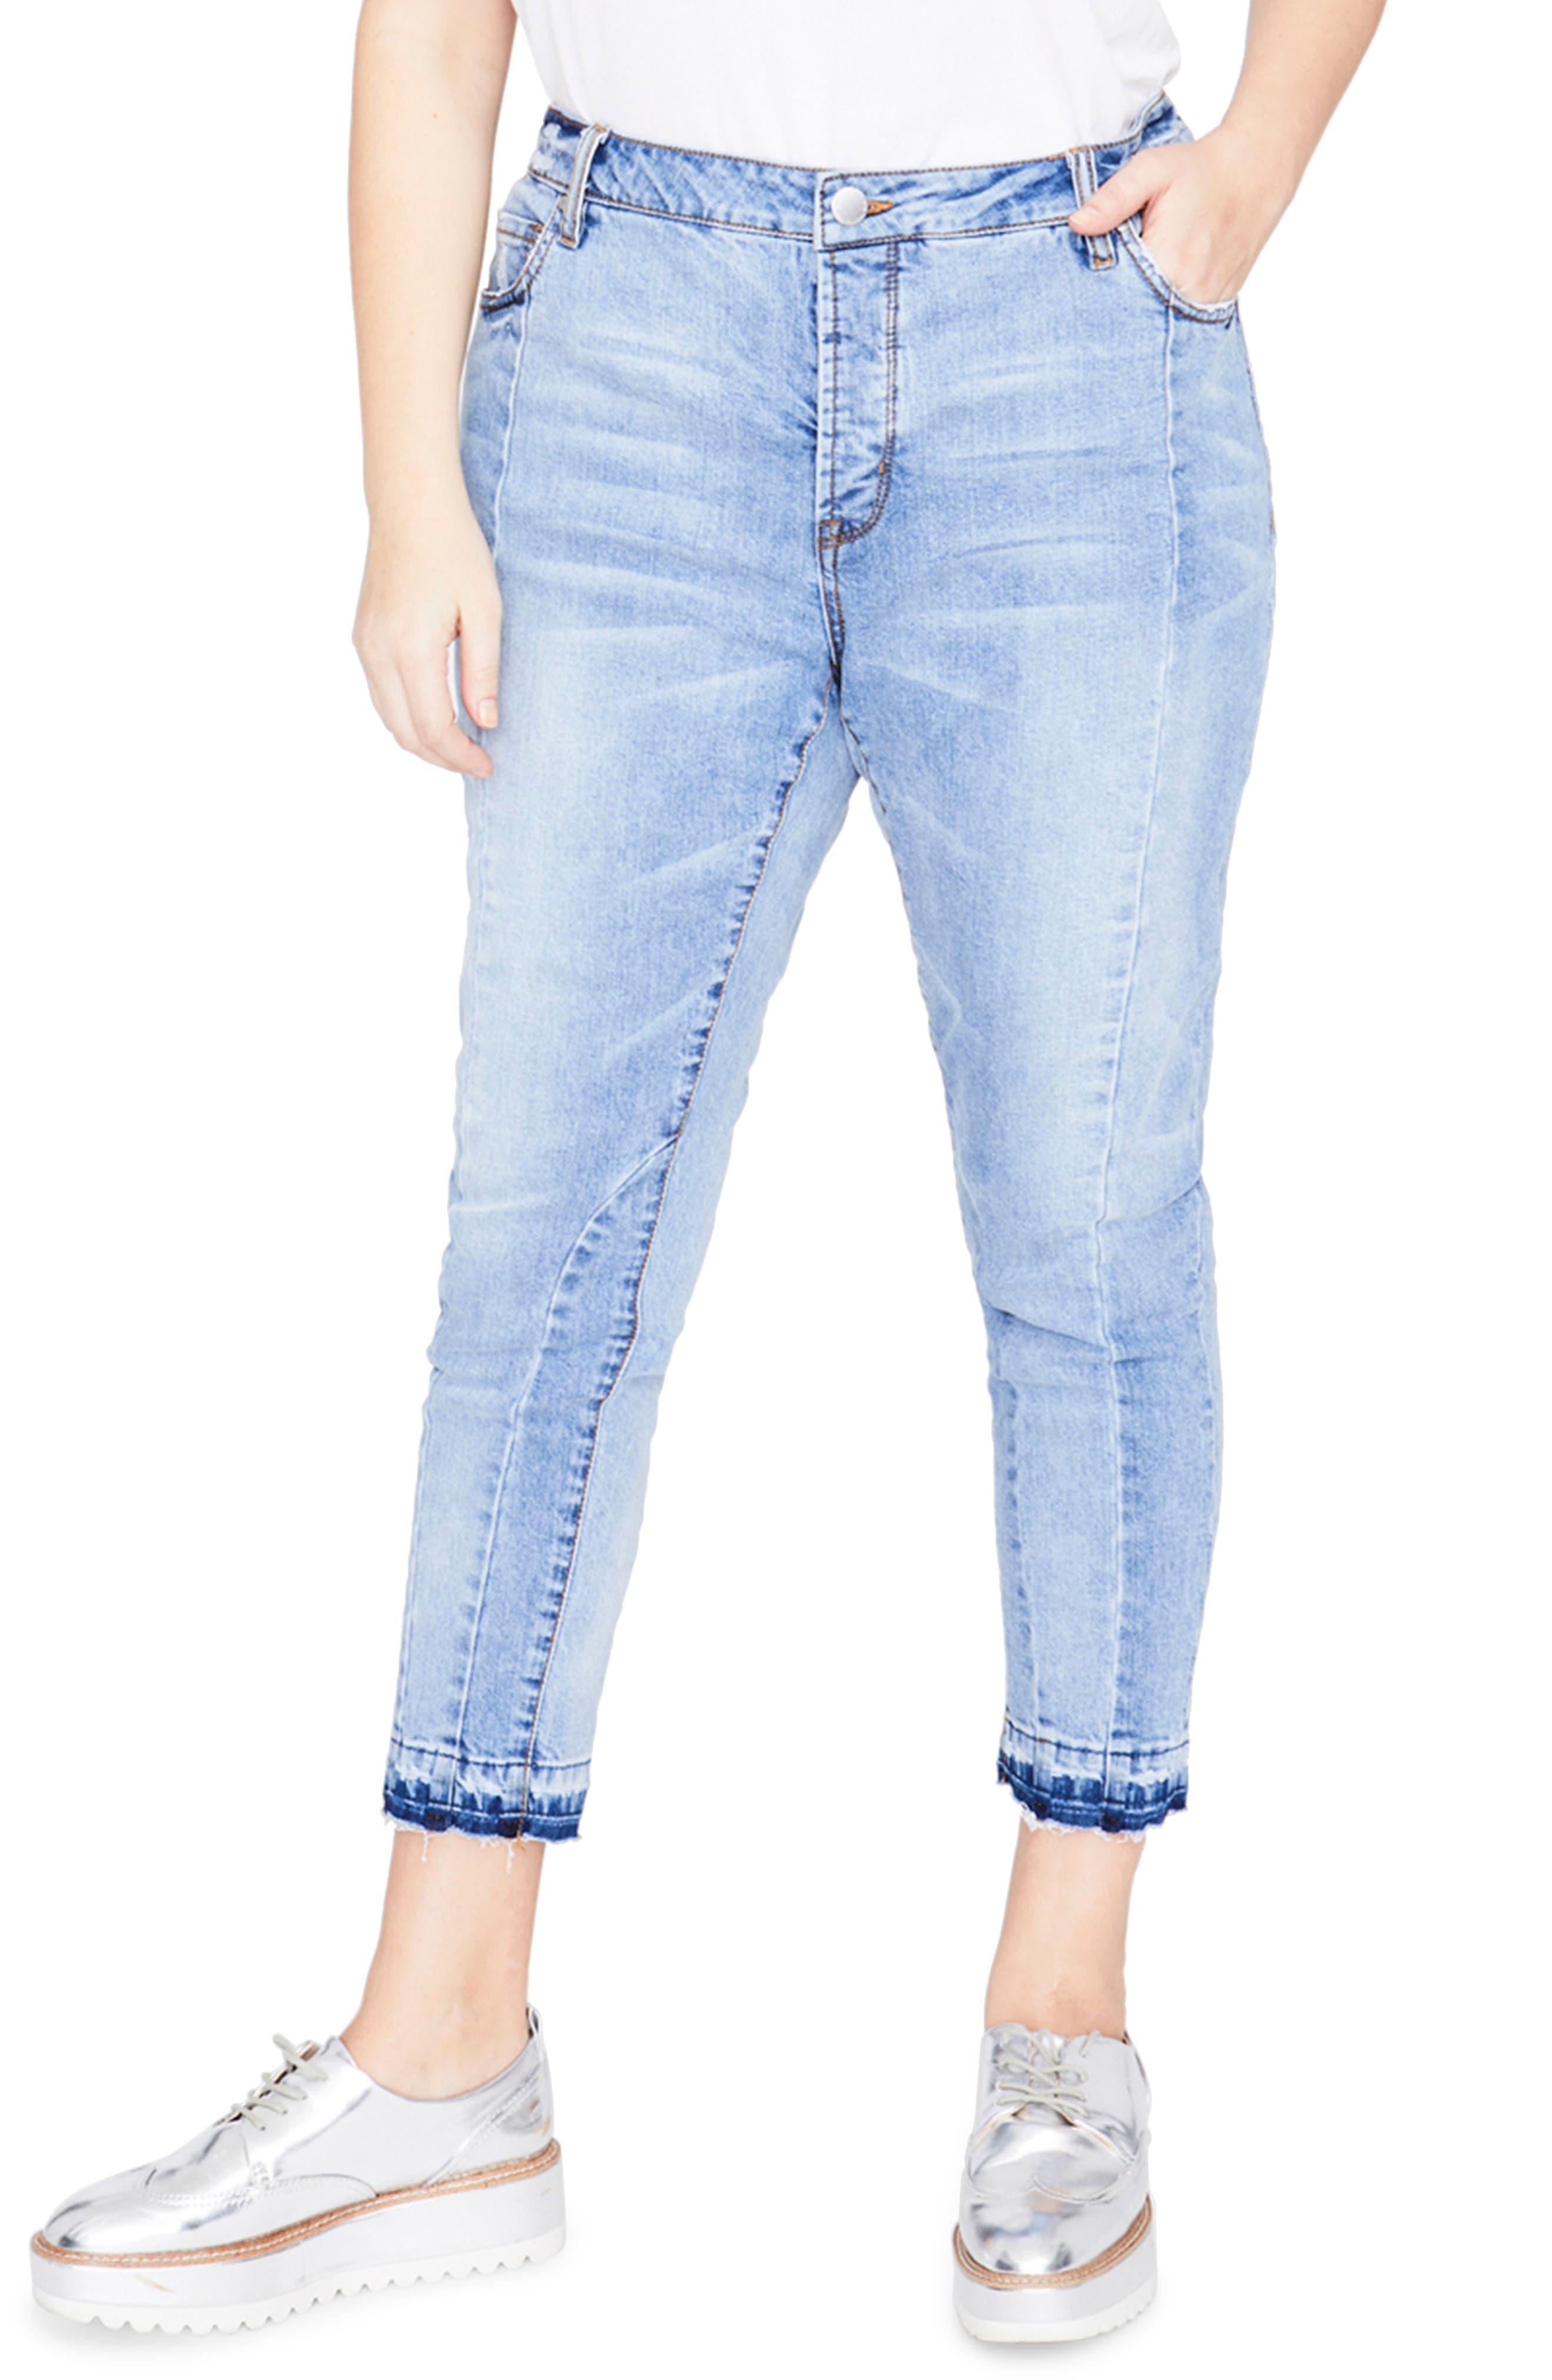 RACHEL Rachel Roy Curvy Seamed Crop Jeans (Valance Wash) (Plus Size)